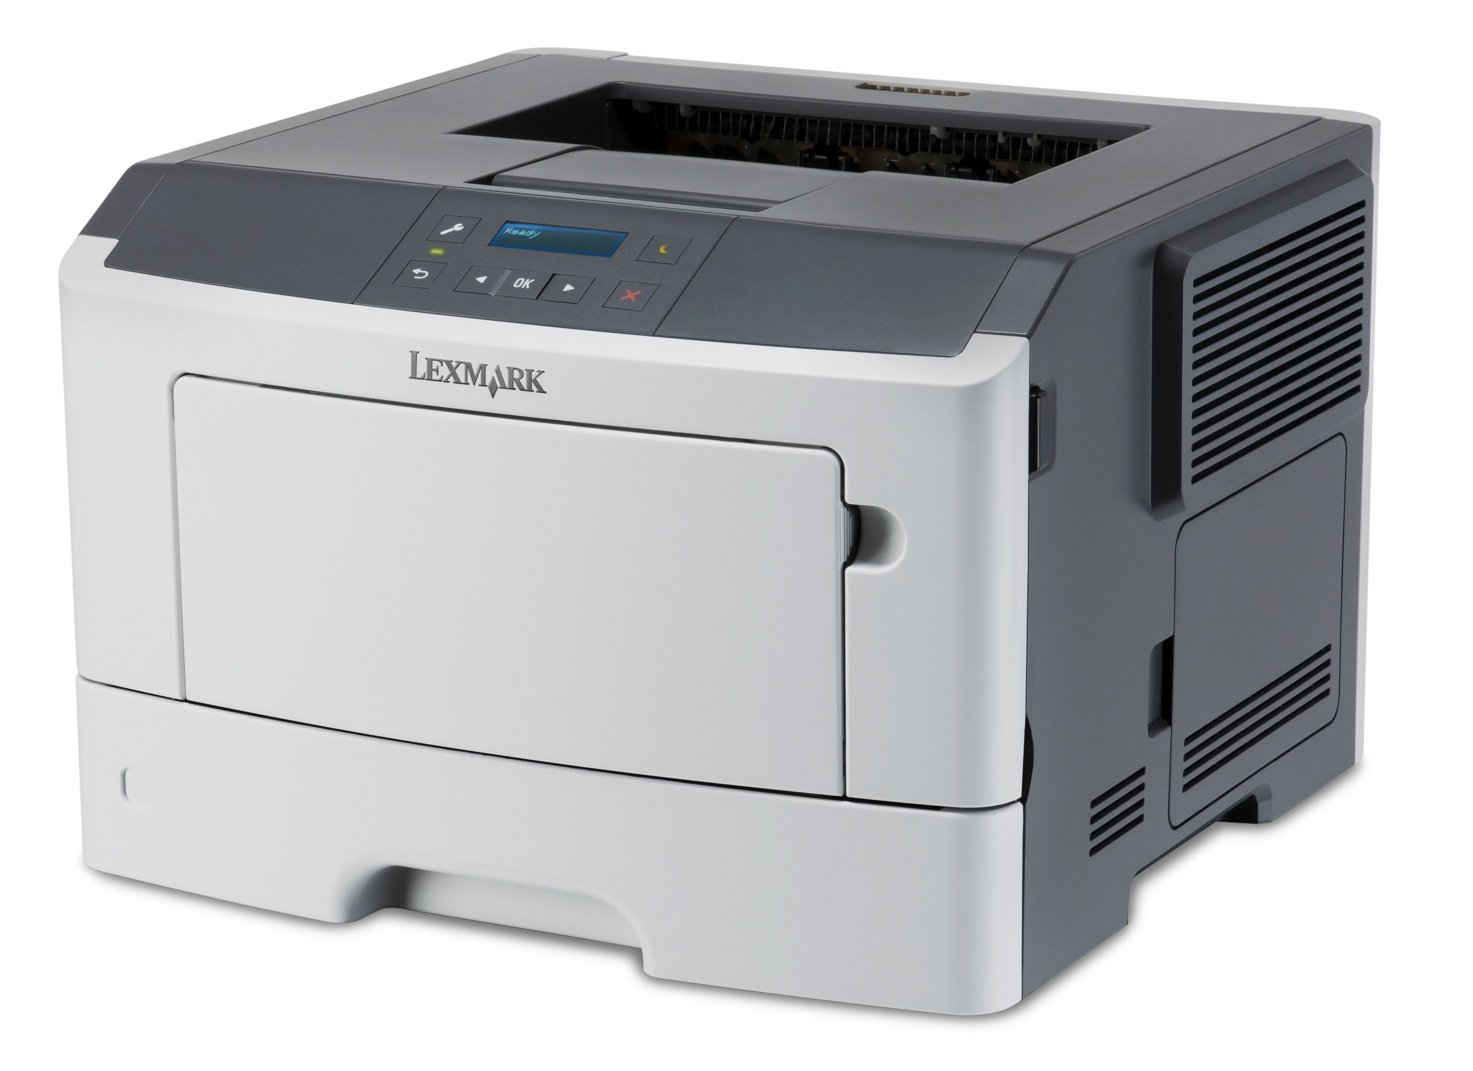 Lexmark MS410D Laserdrucker (1200 dpi, USB 2.0, 54 dB(A), DIN A4) graphit/weiß 35S0170